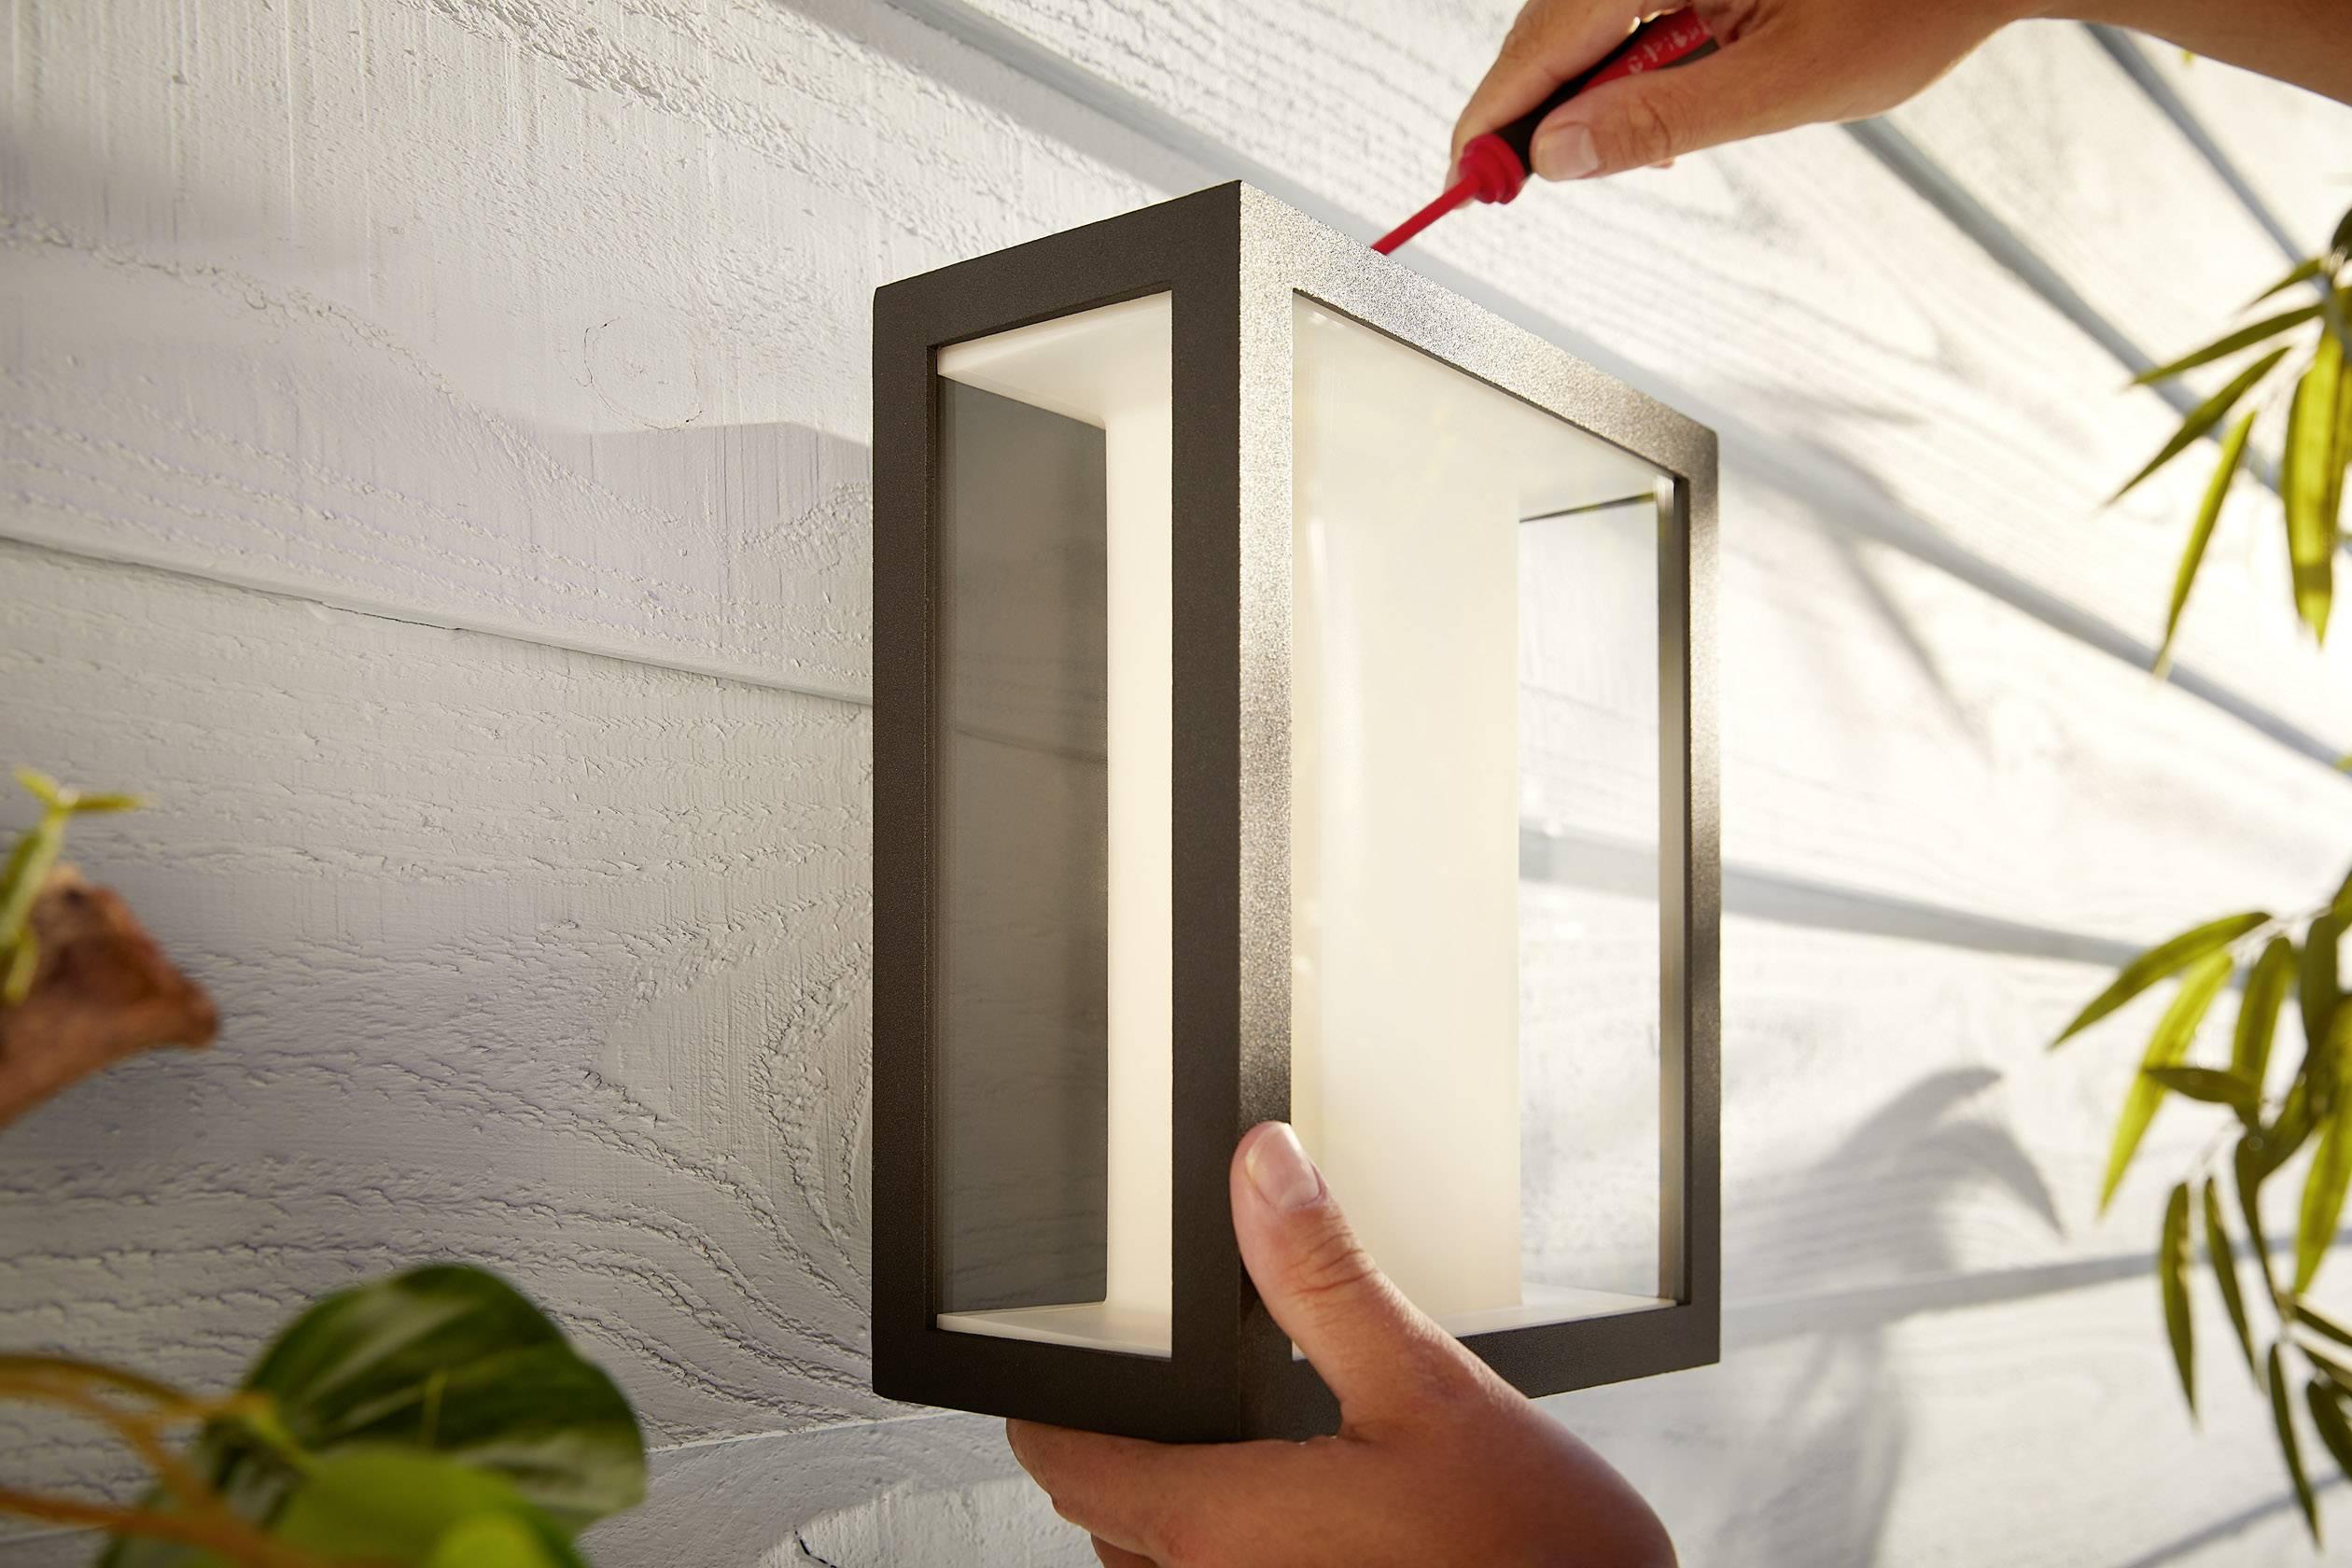 Philips lighting hue led outdoor wall light impress eec led a